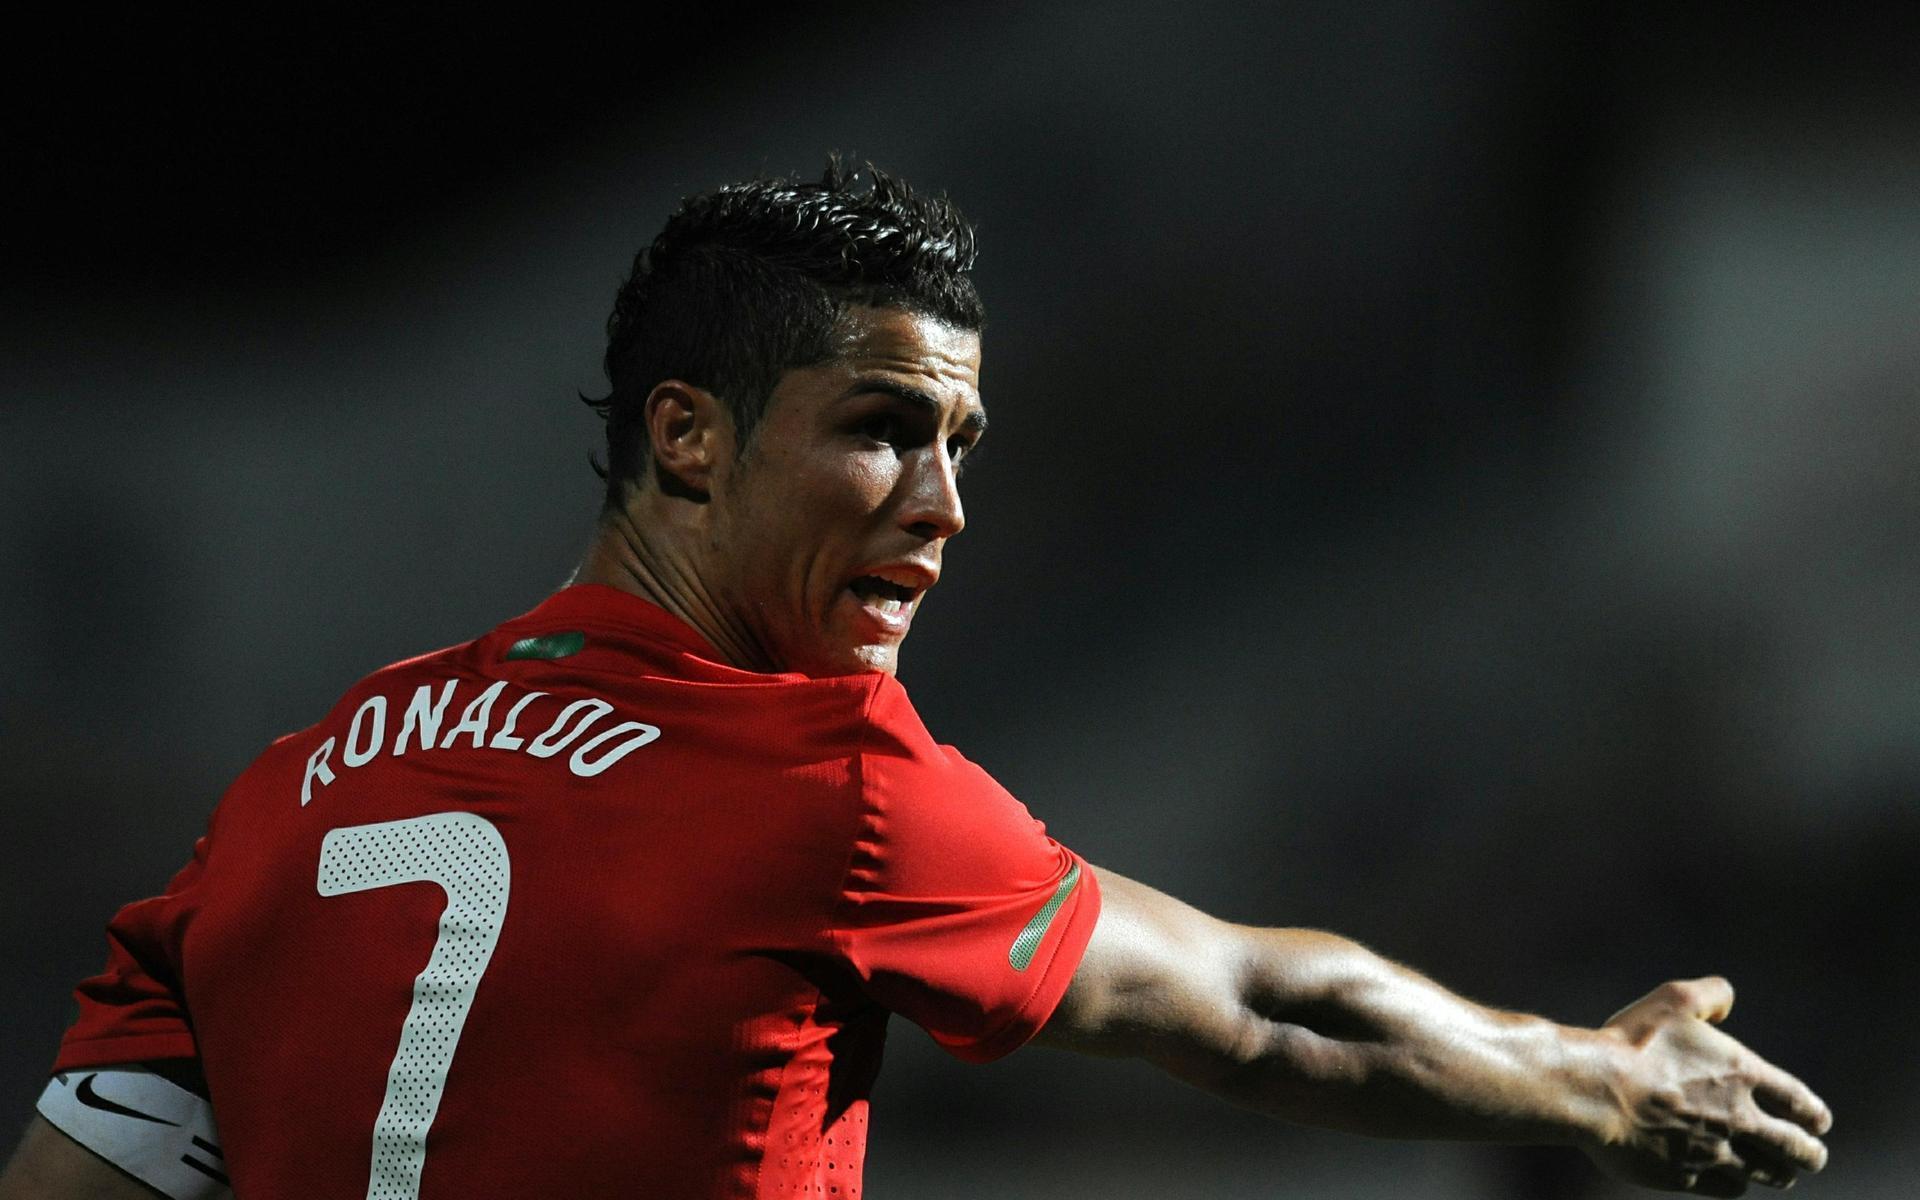 1920x1200 Cristiano Ronaldo Hình nền HD